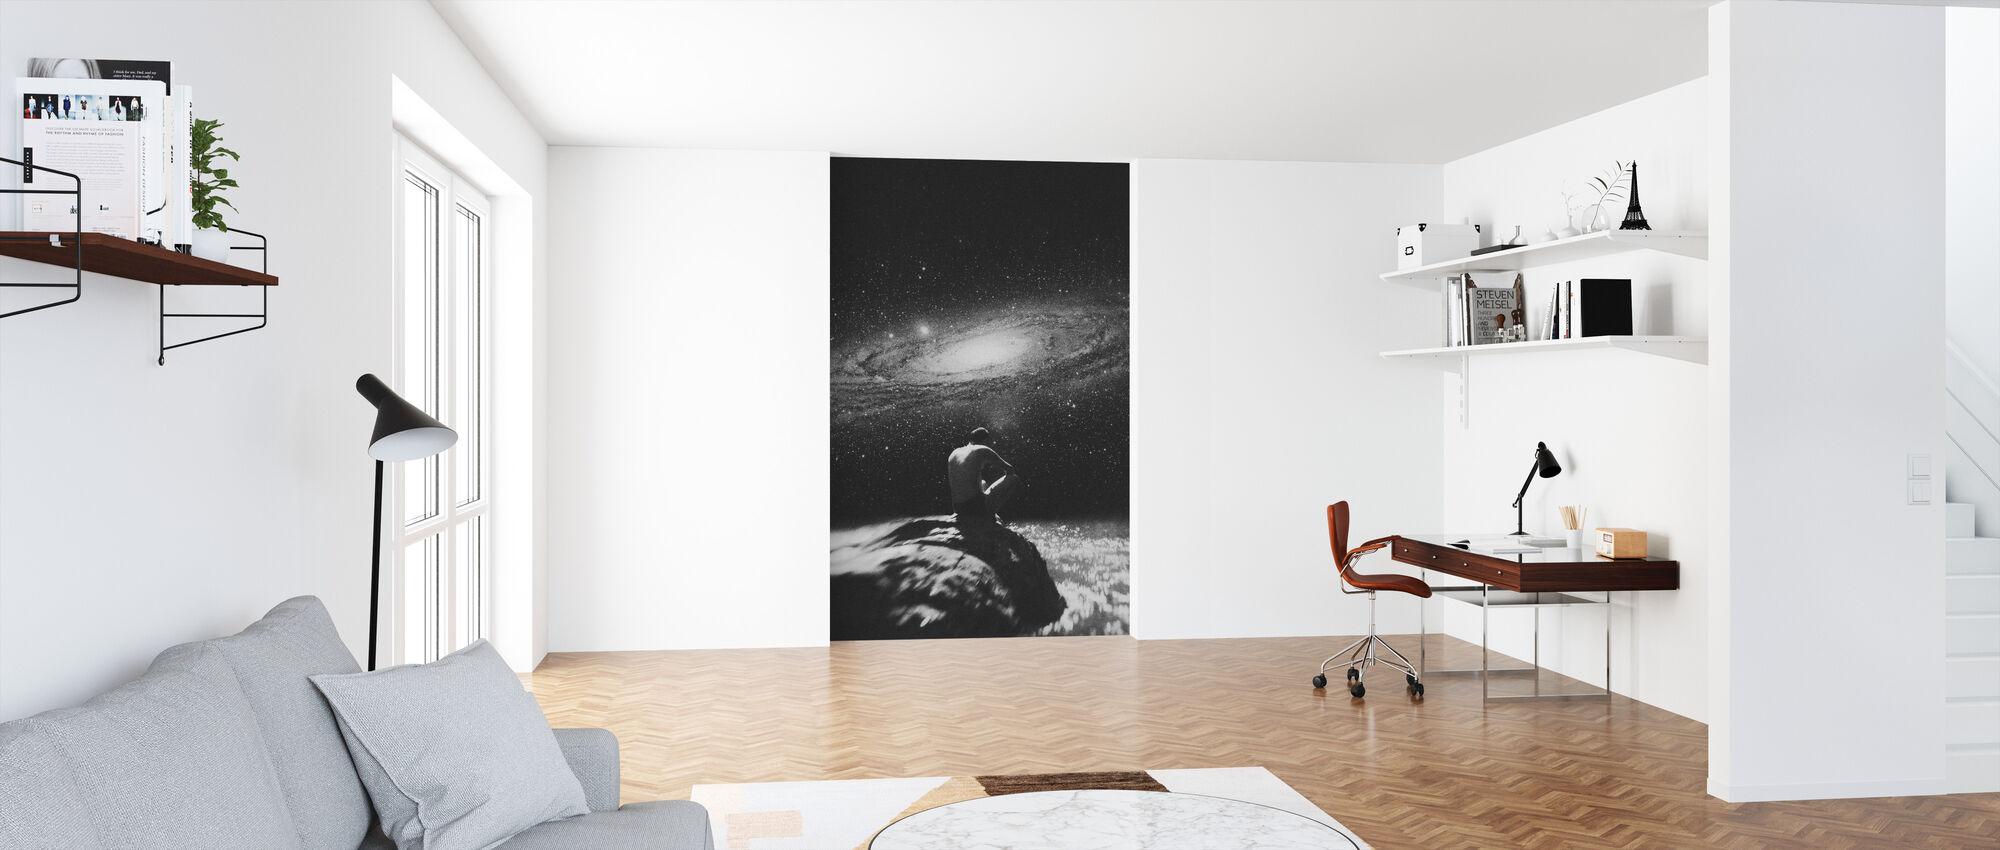 Pantheism - Wallpaper - Office